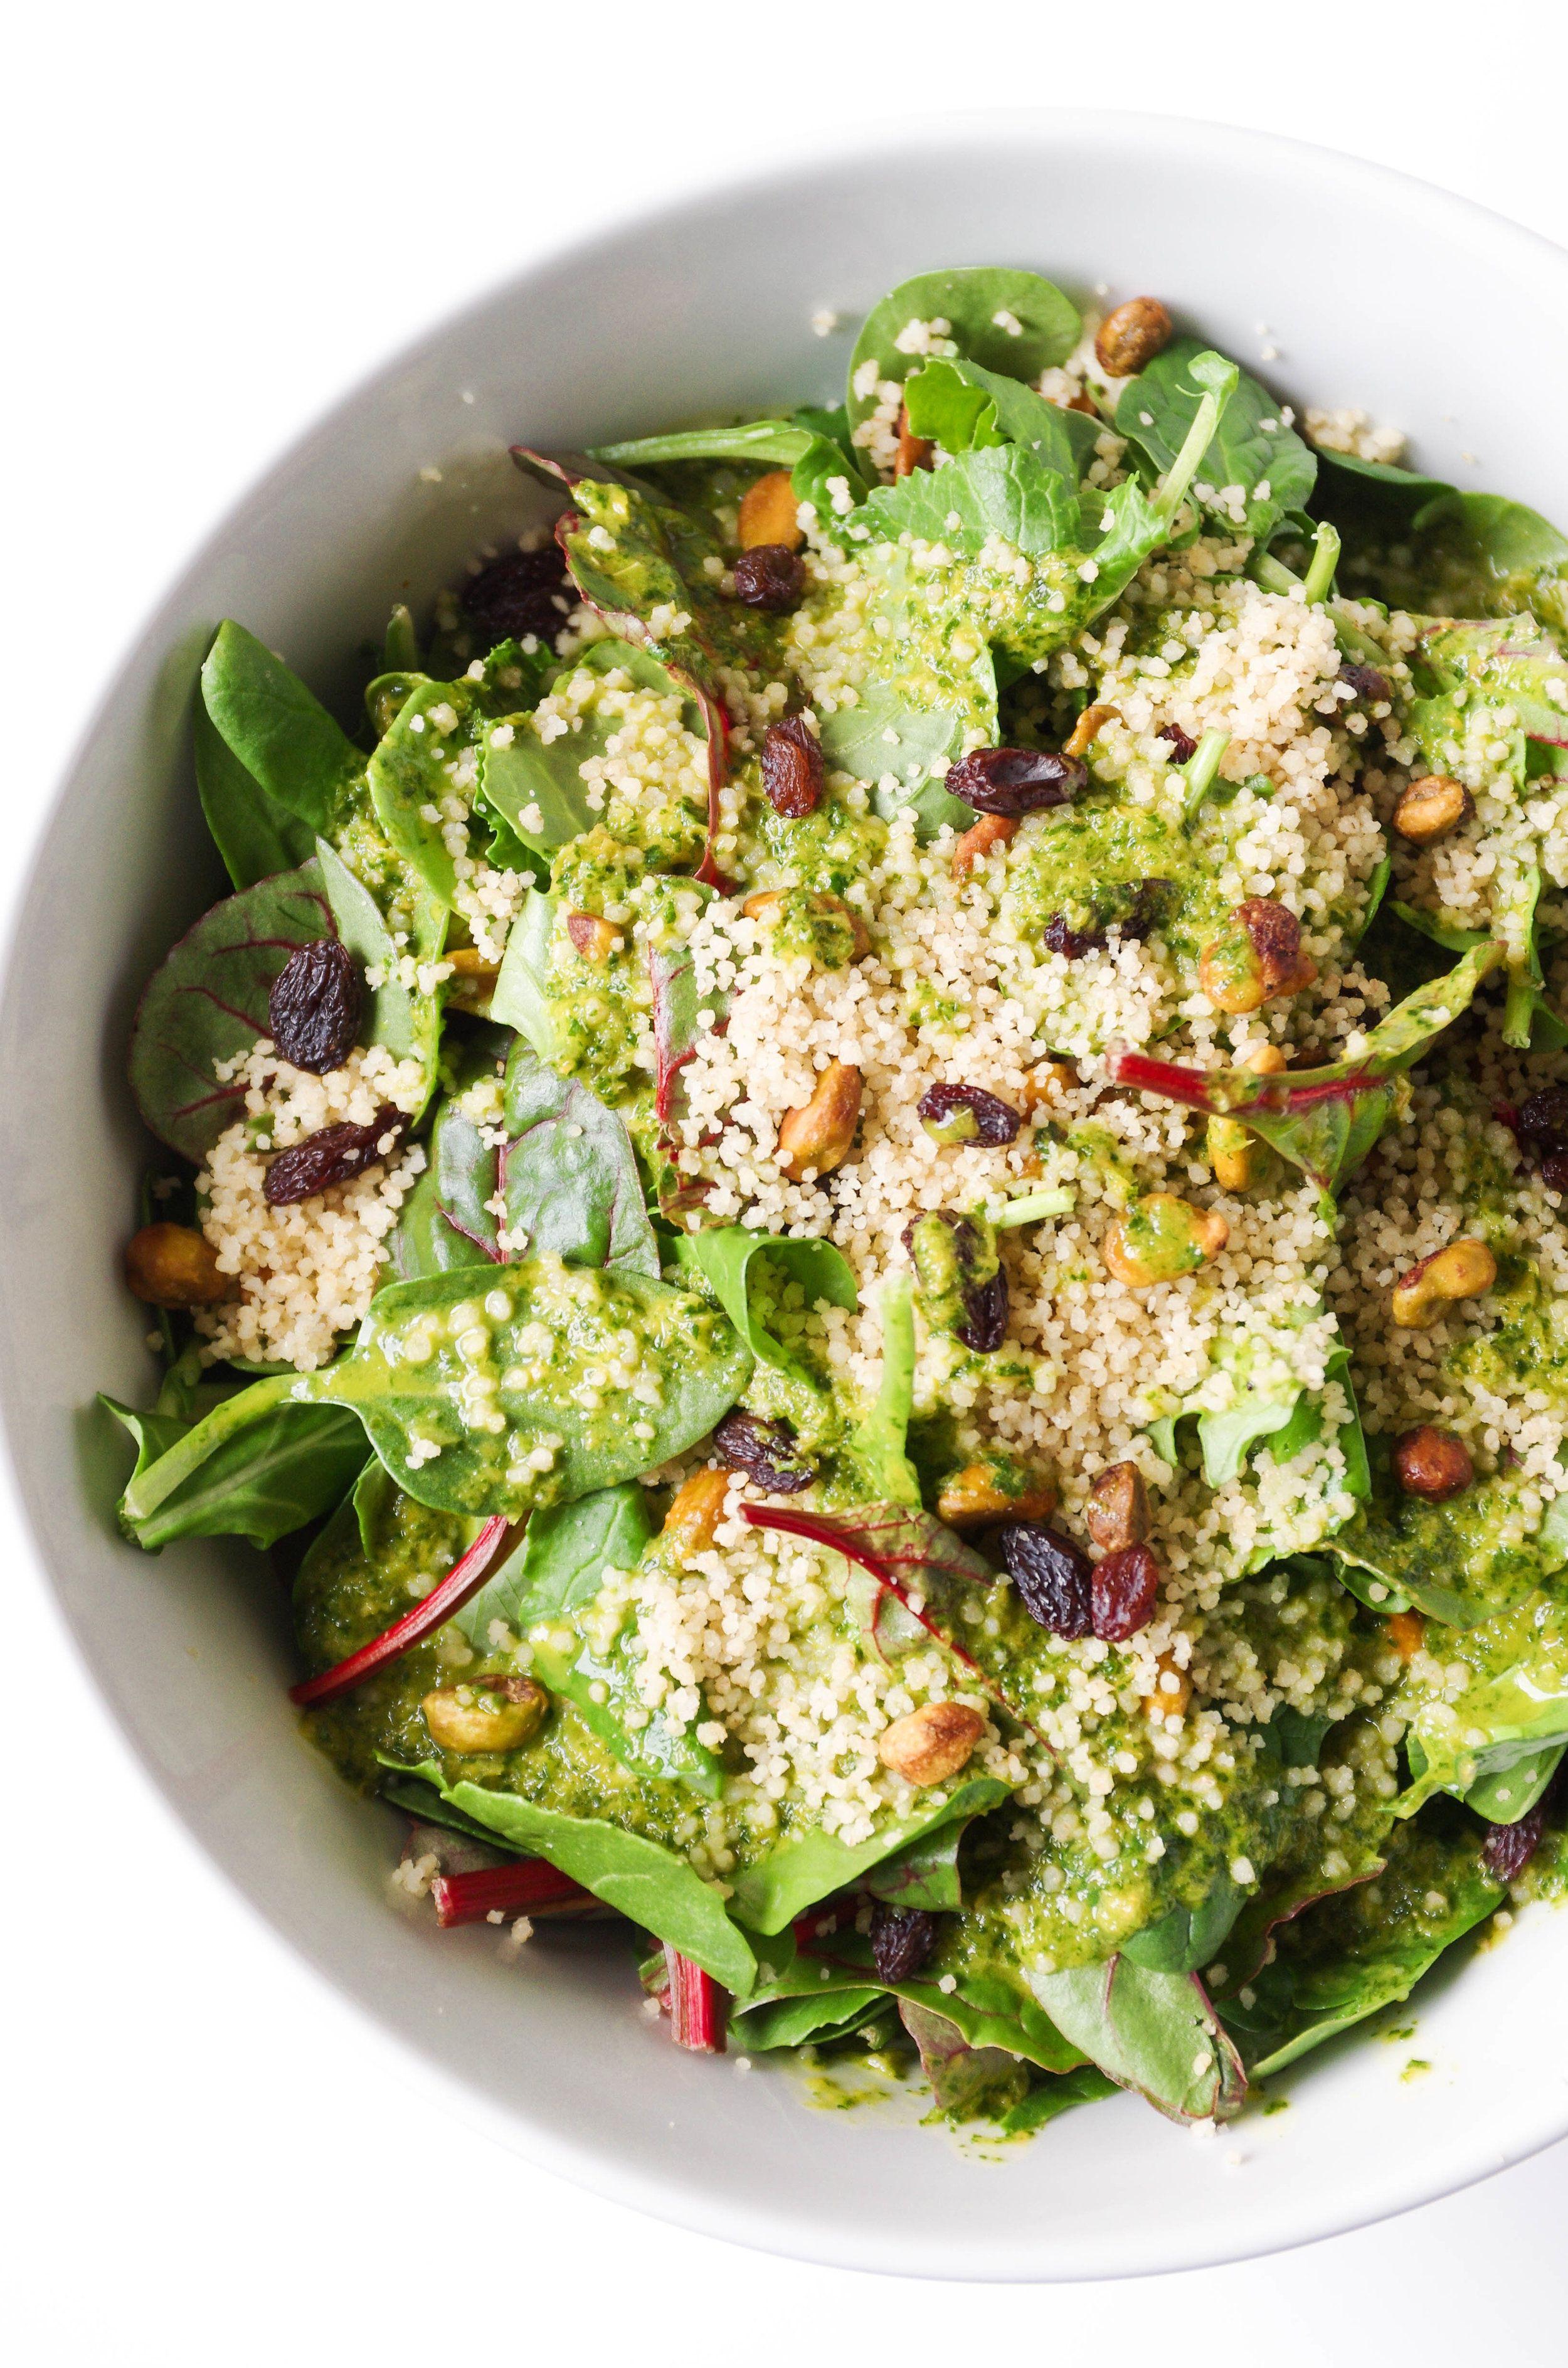 Couscous and Kale Salad with Cilantro Orange Vinaigrette, http://www.coffeeandcrayons.net/blog/2016/9/8/couscous-salad-with-cilantro-orange-vinaigrette